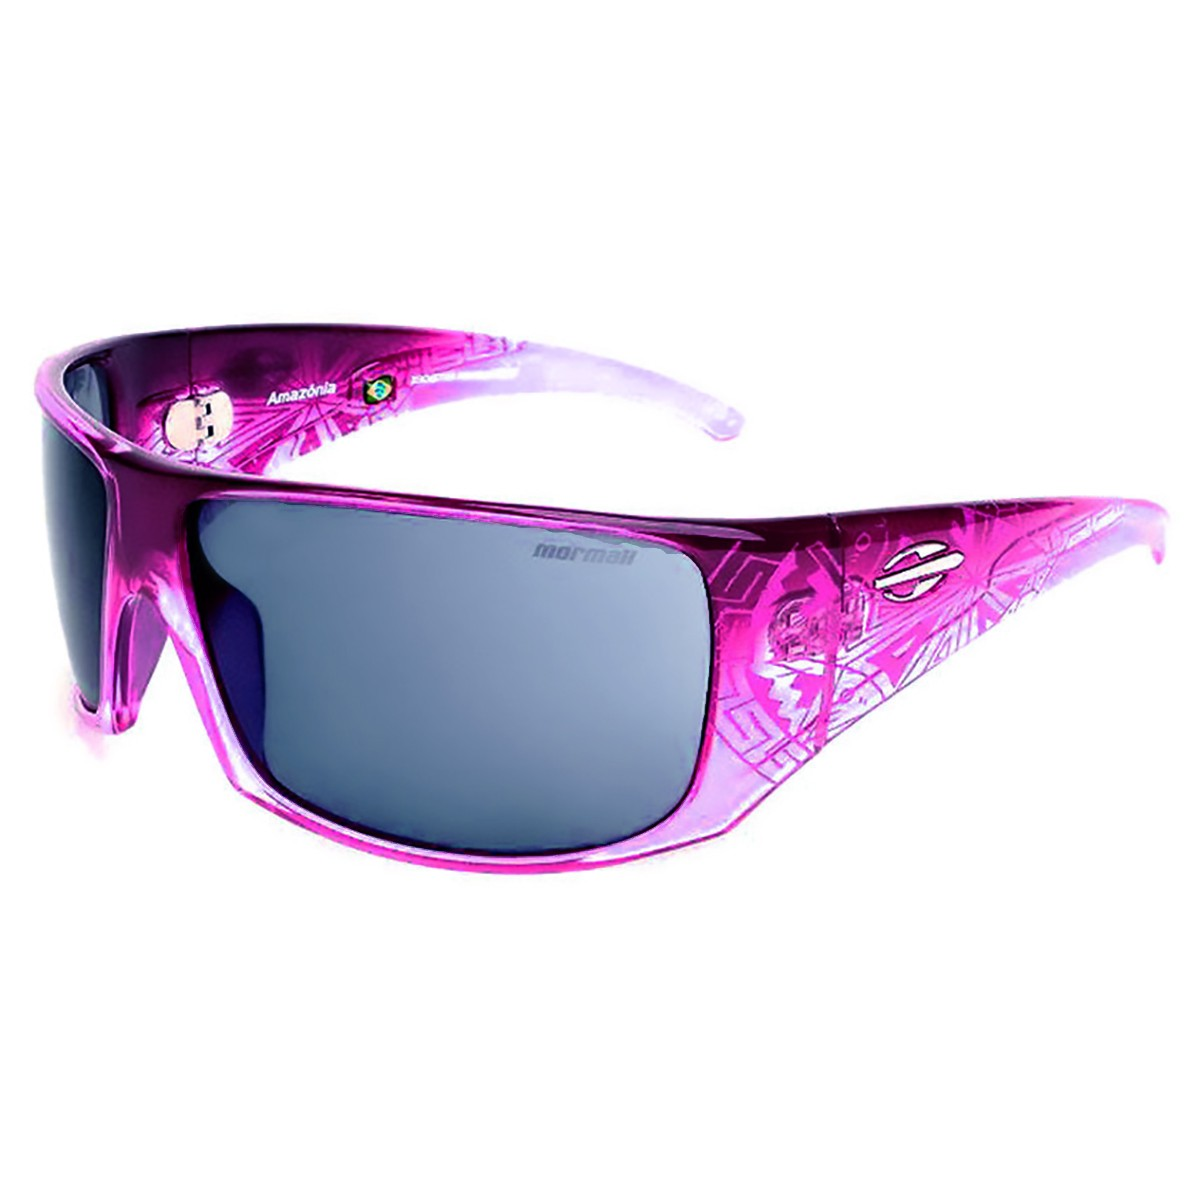 Compre Óculos de Sol Mormaii Amazonia em 10X   Tri-Jóia Shop b622b57b44